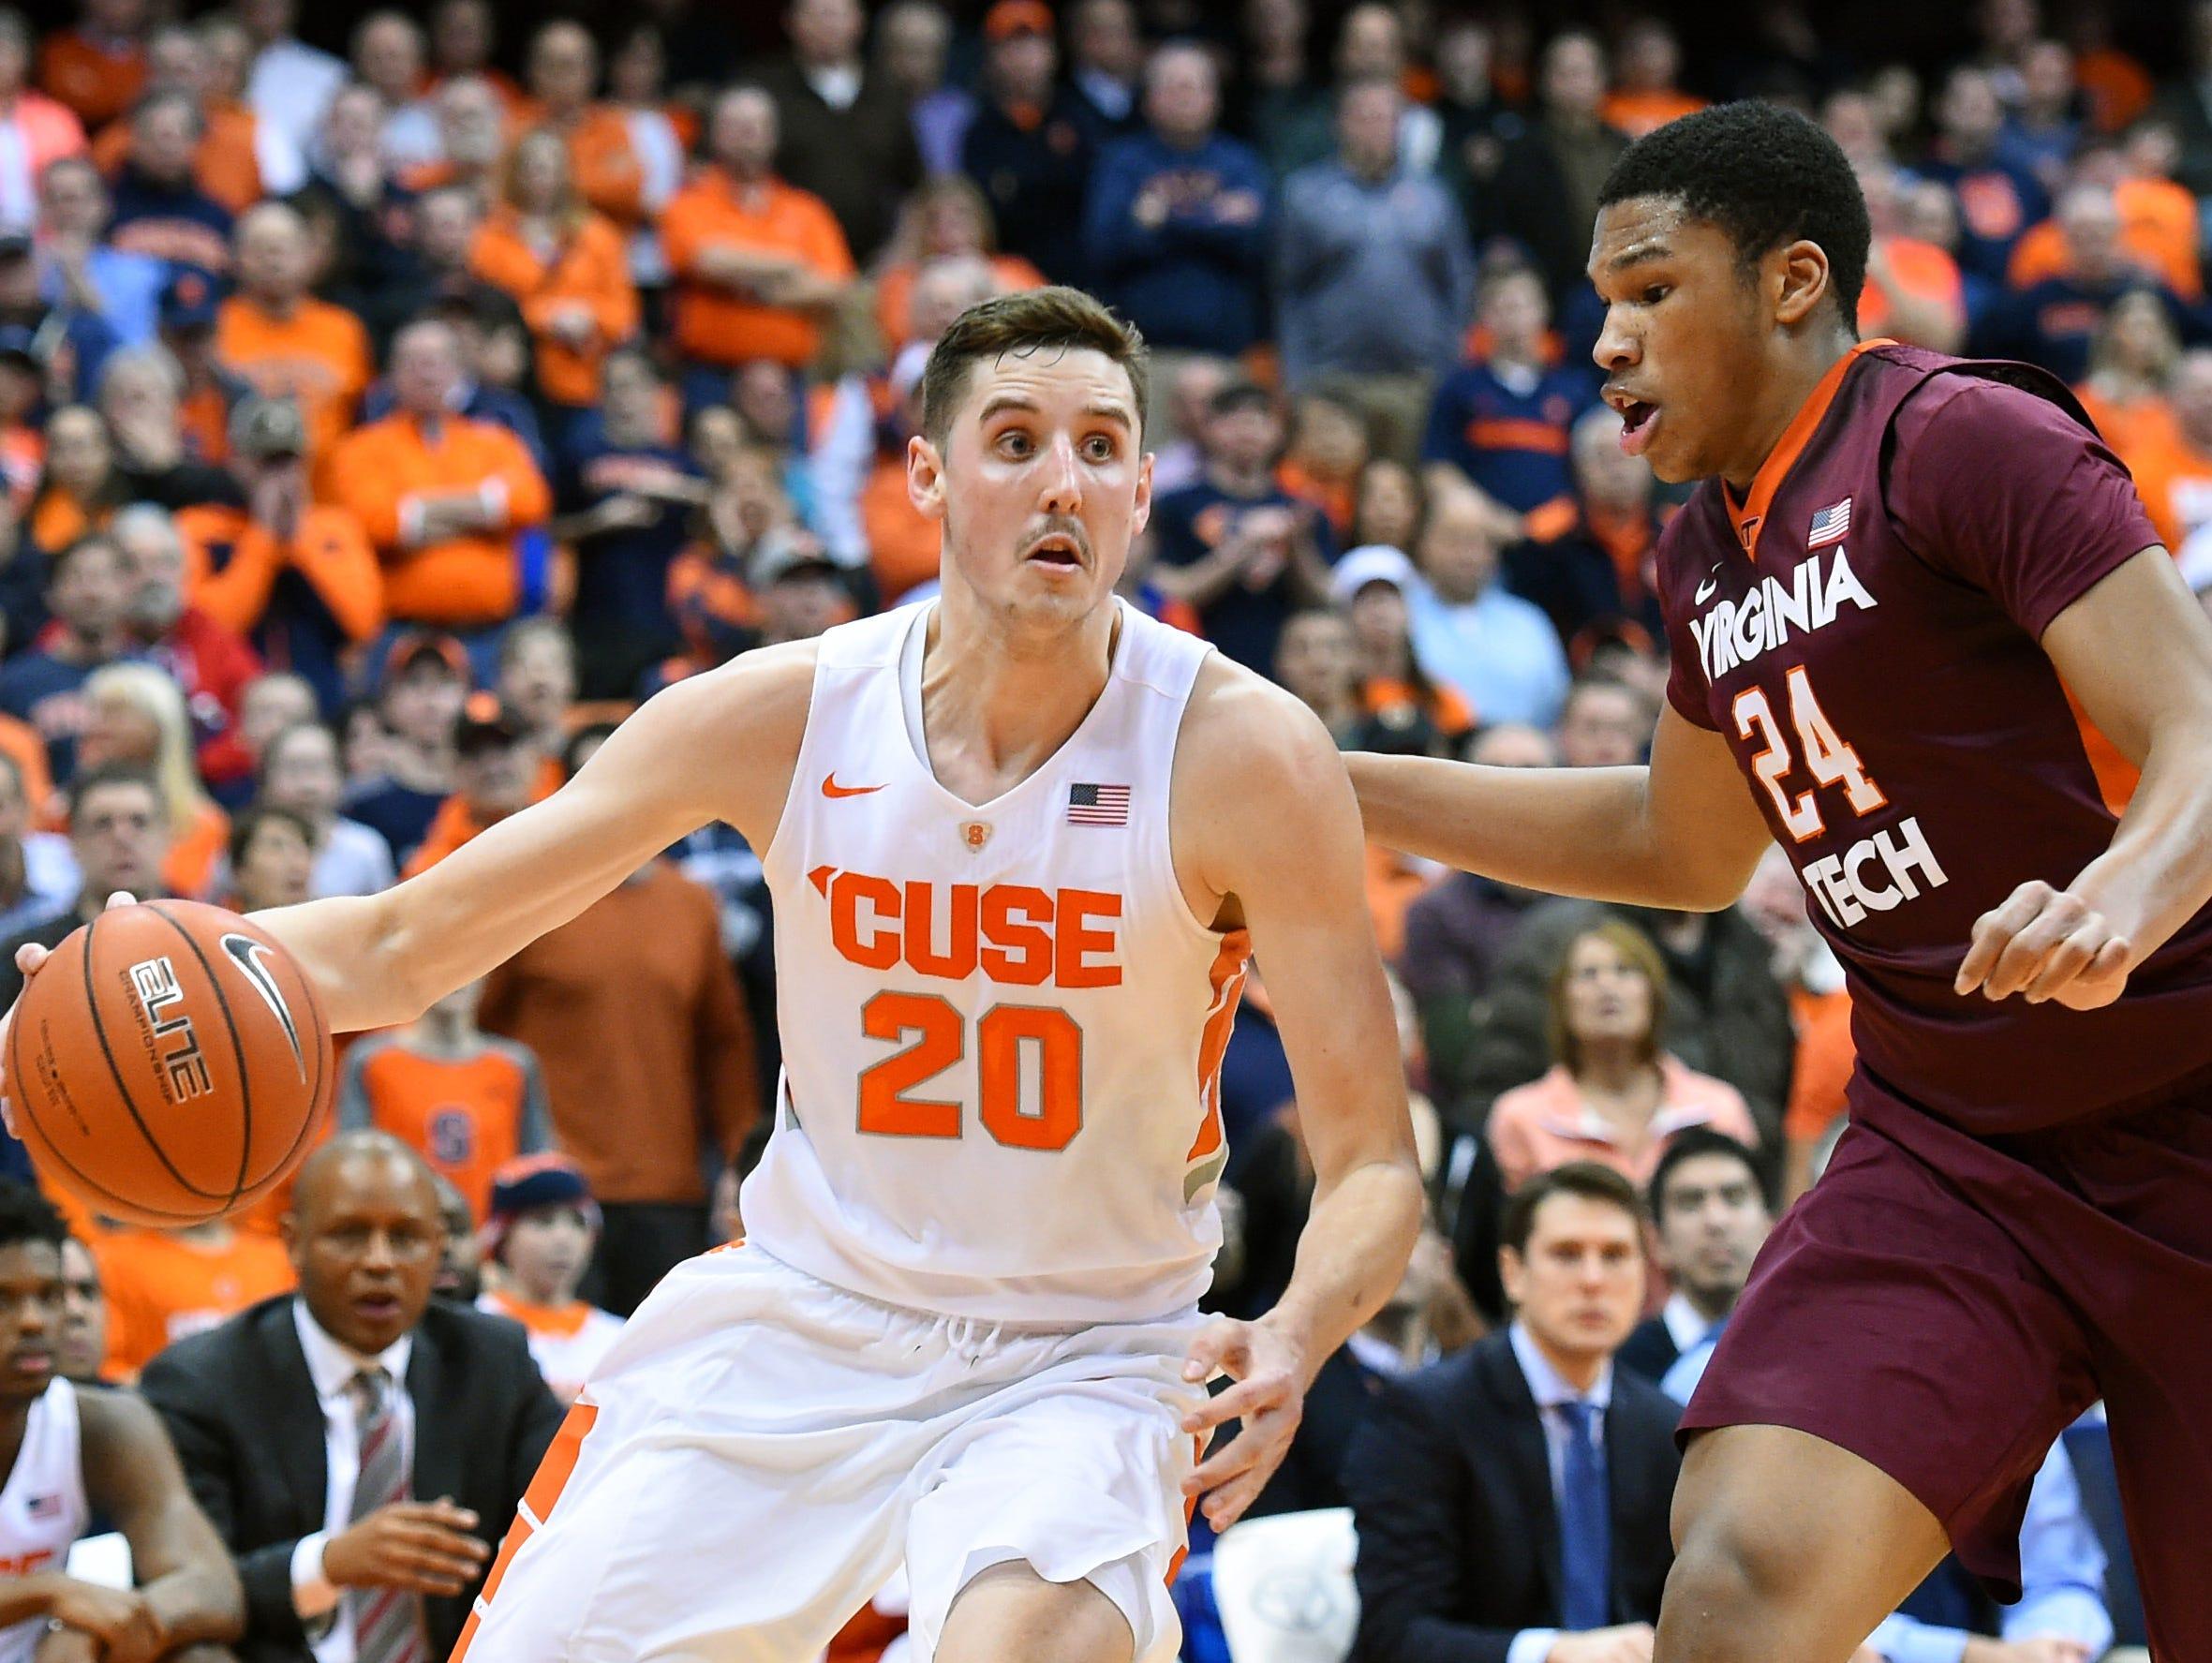 Syracuse's Tyler Lydon tries to dribble past Virginia Tech's Kerry Blackshear Jr. on Feb. 2 in Syracuse.